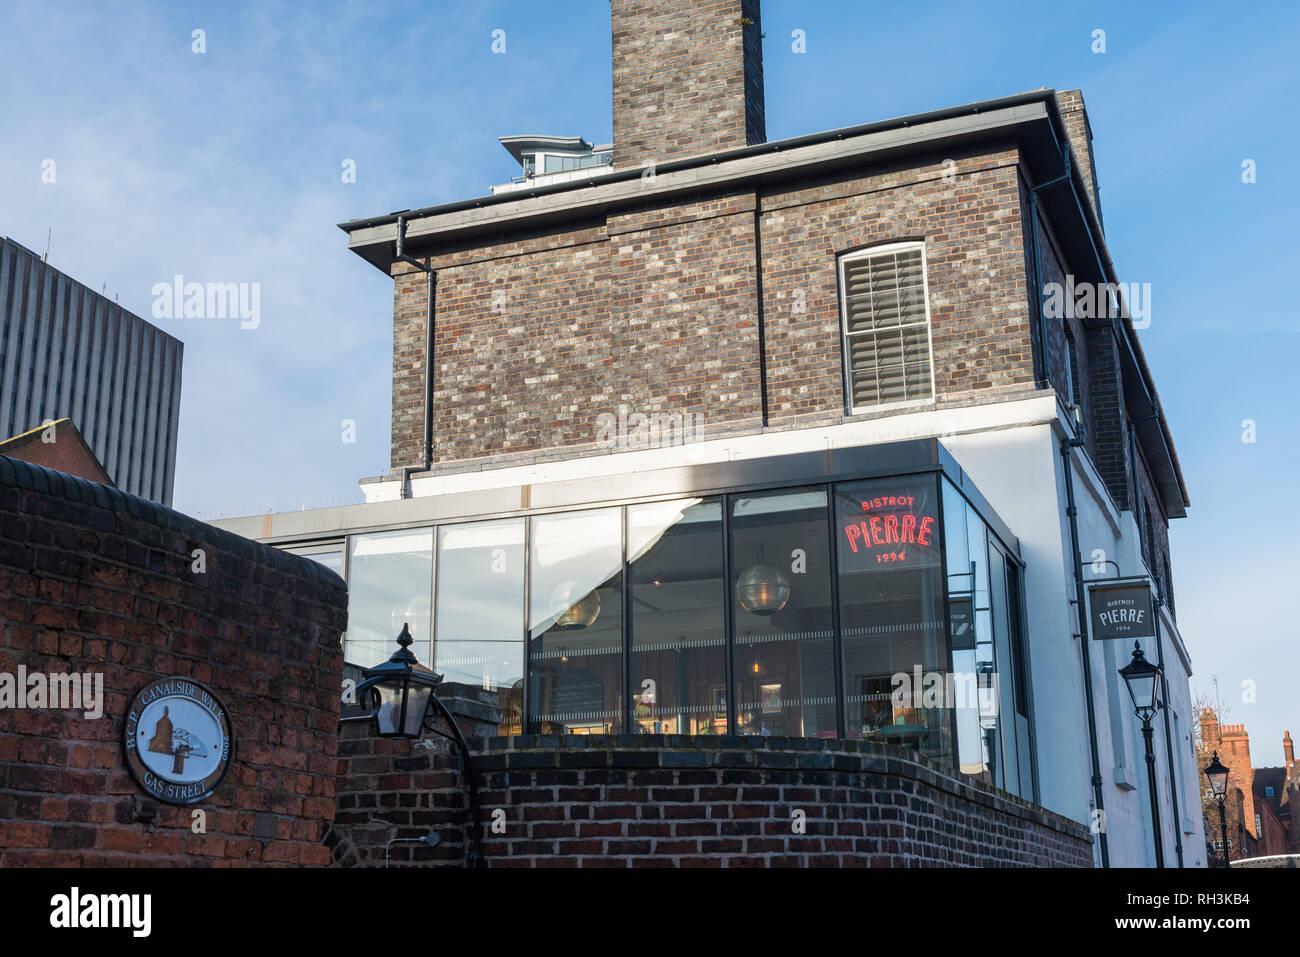 Bistrot Pierre french restaurant in Gas Street Basin, Birmingham - Stock Image